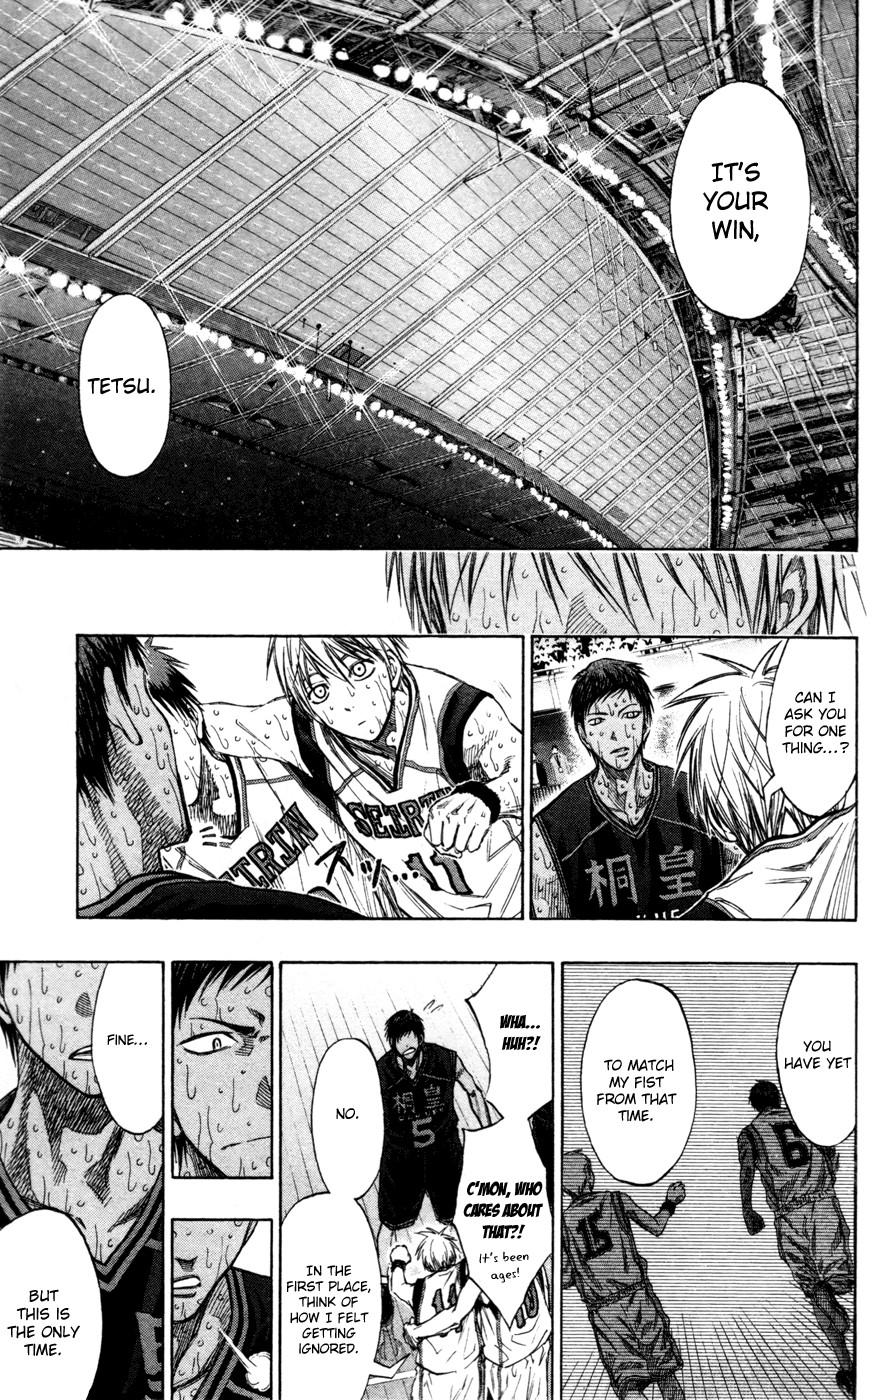 Kuroko no Basket Manga Chapter 139 - Image 13